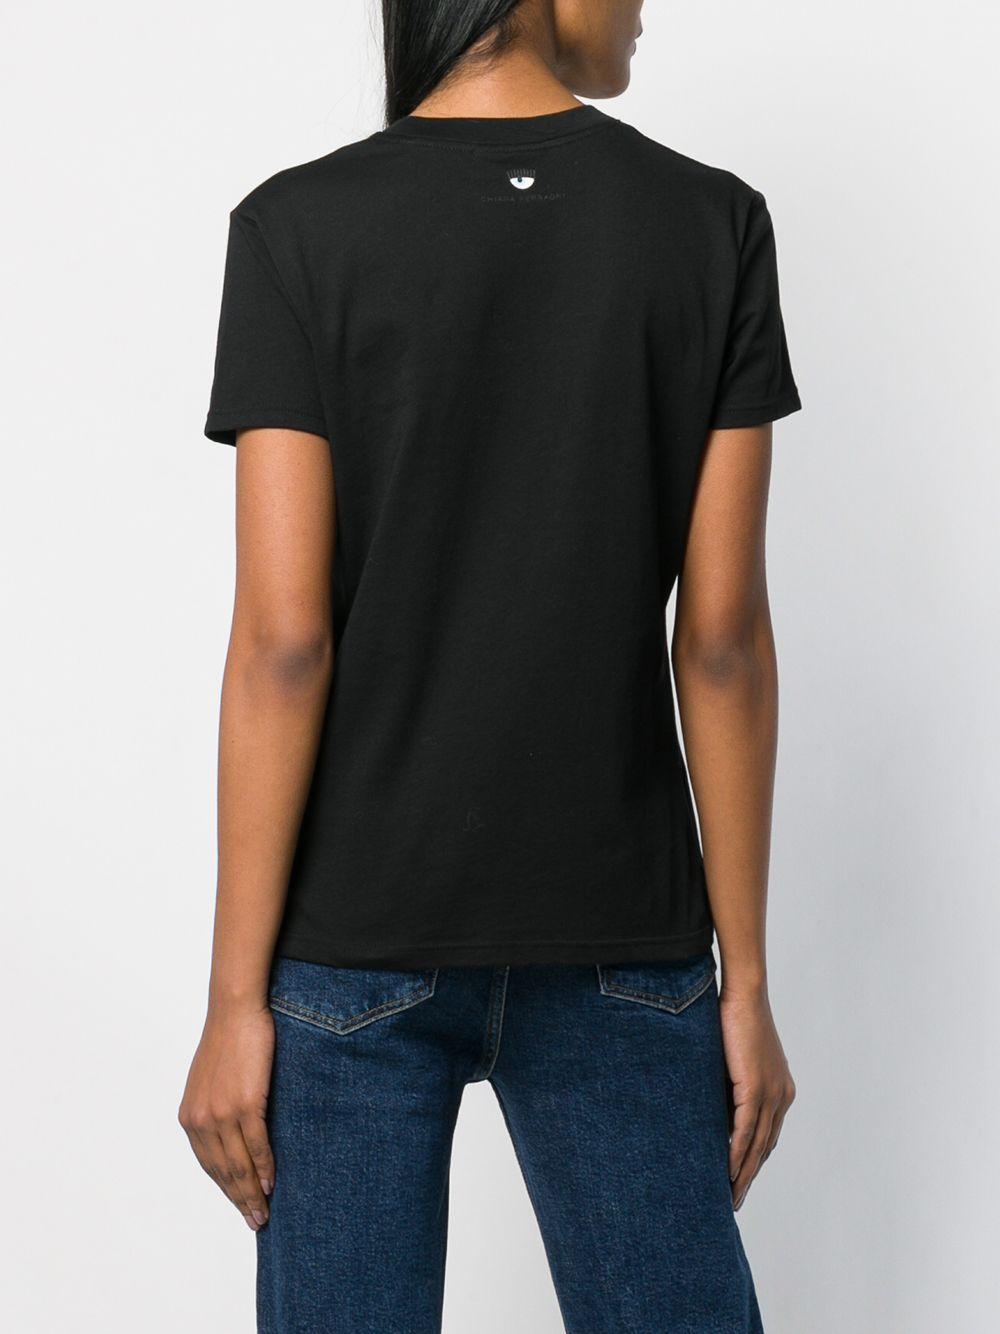 Picture of Chiara Ferragni | Embroidered Wink T-Shirt